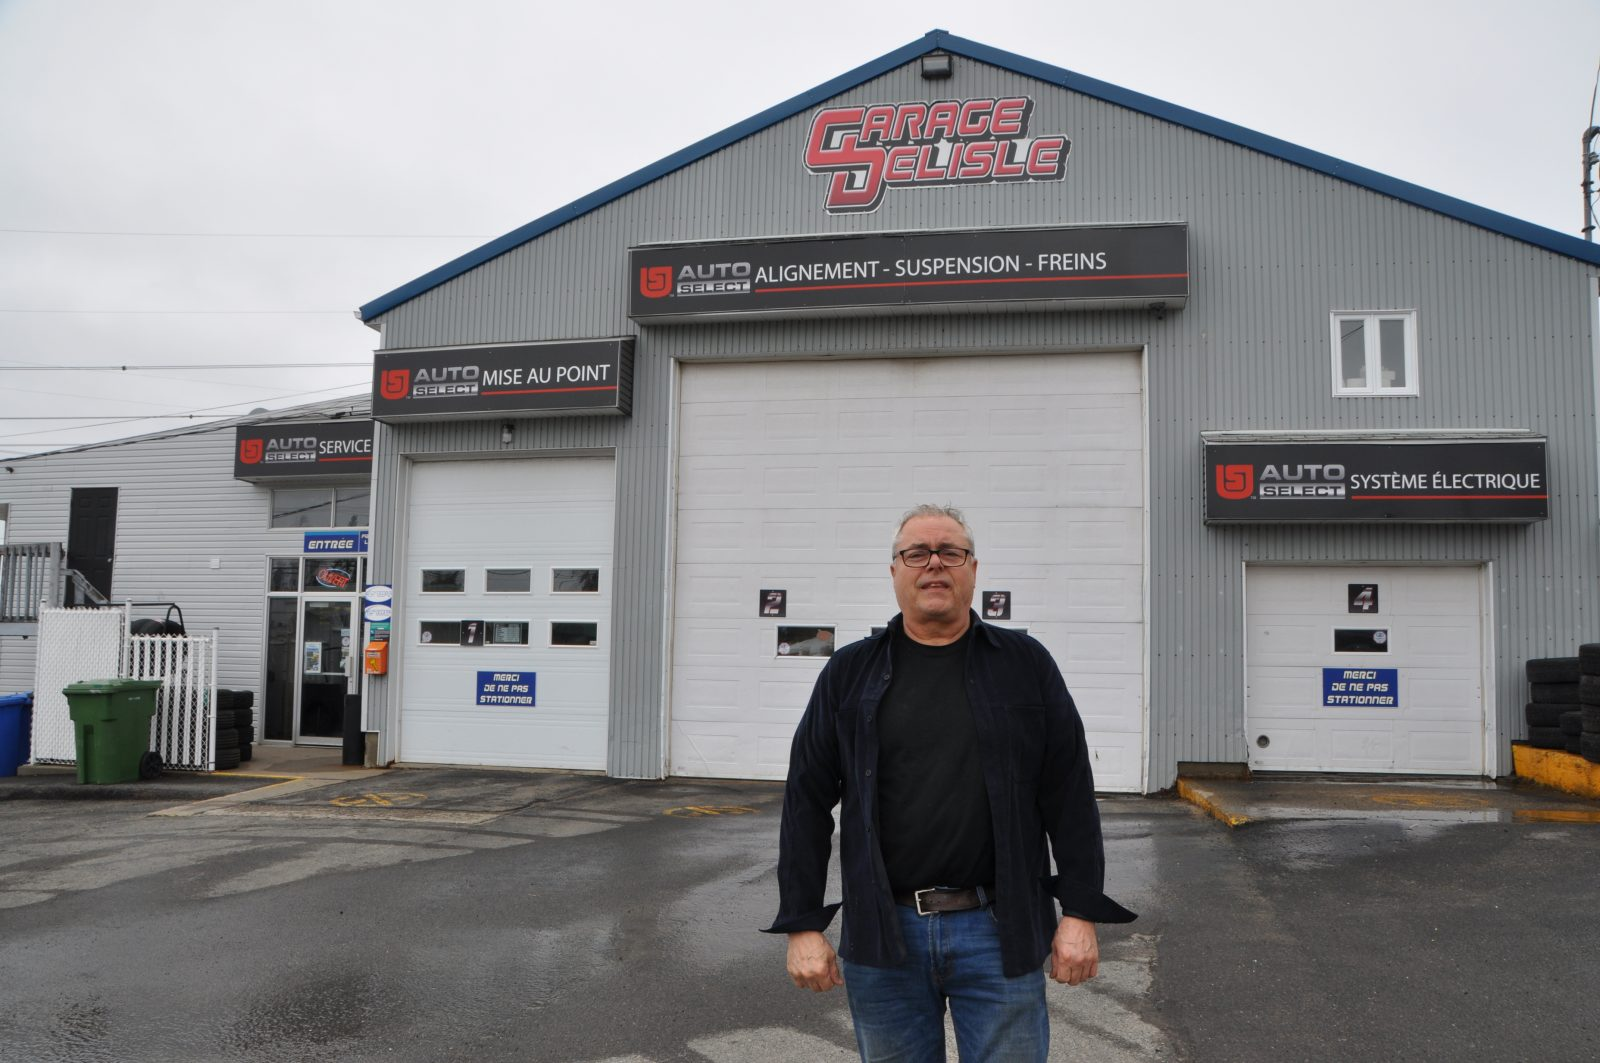 Garage Delisle : investir, se développer et innover pour garder son staff!